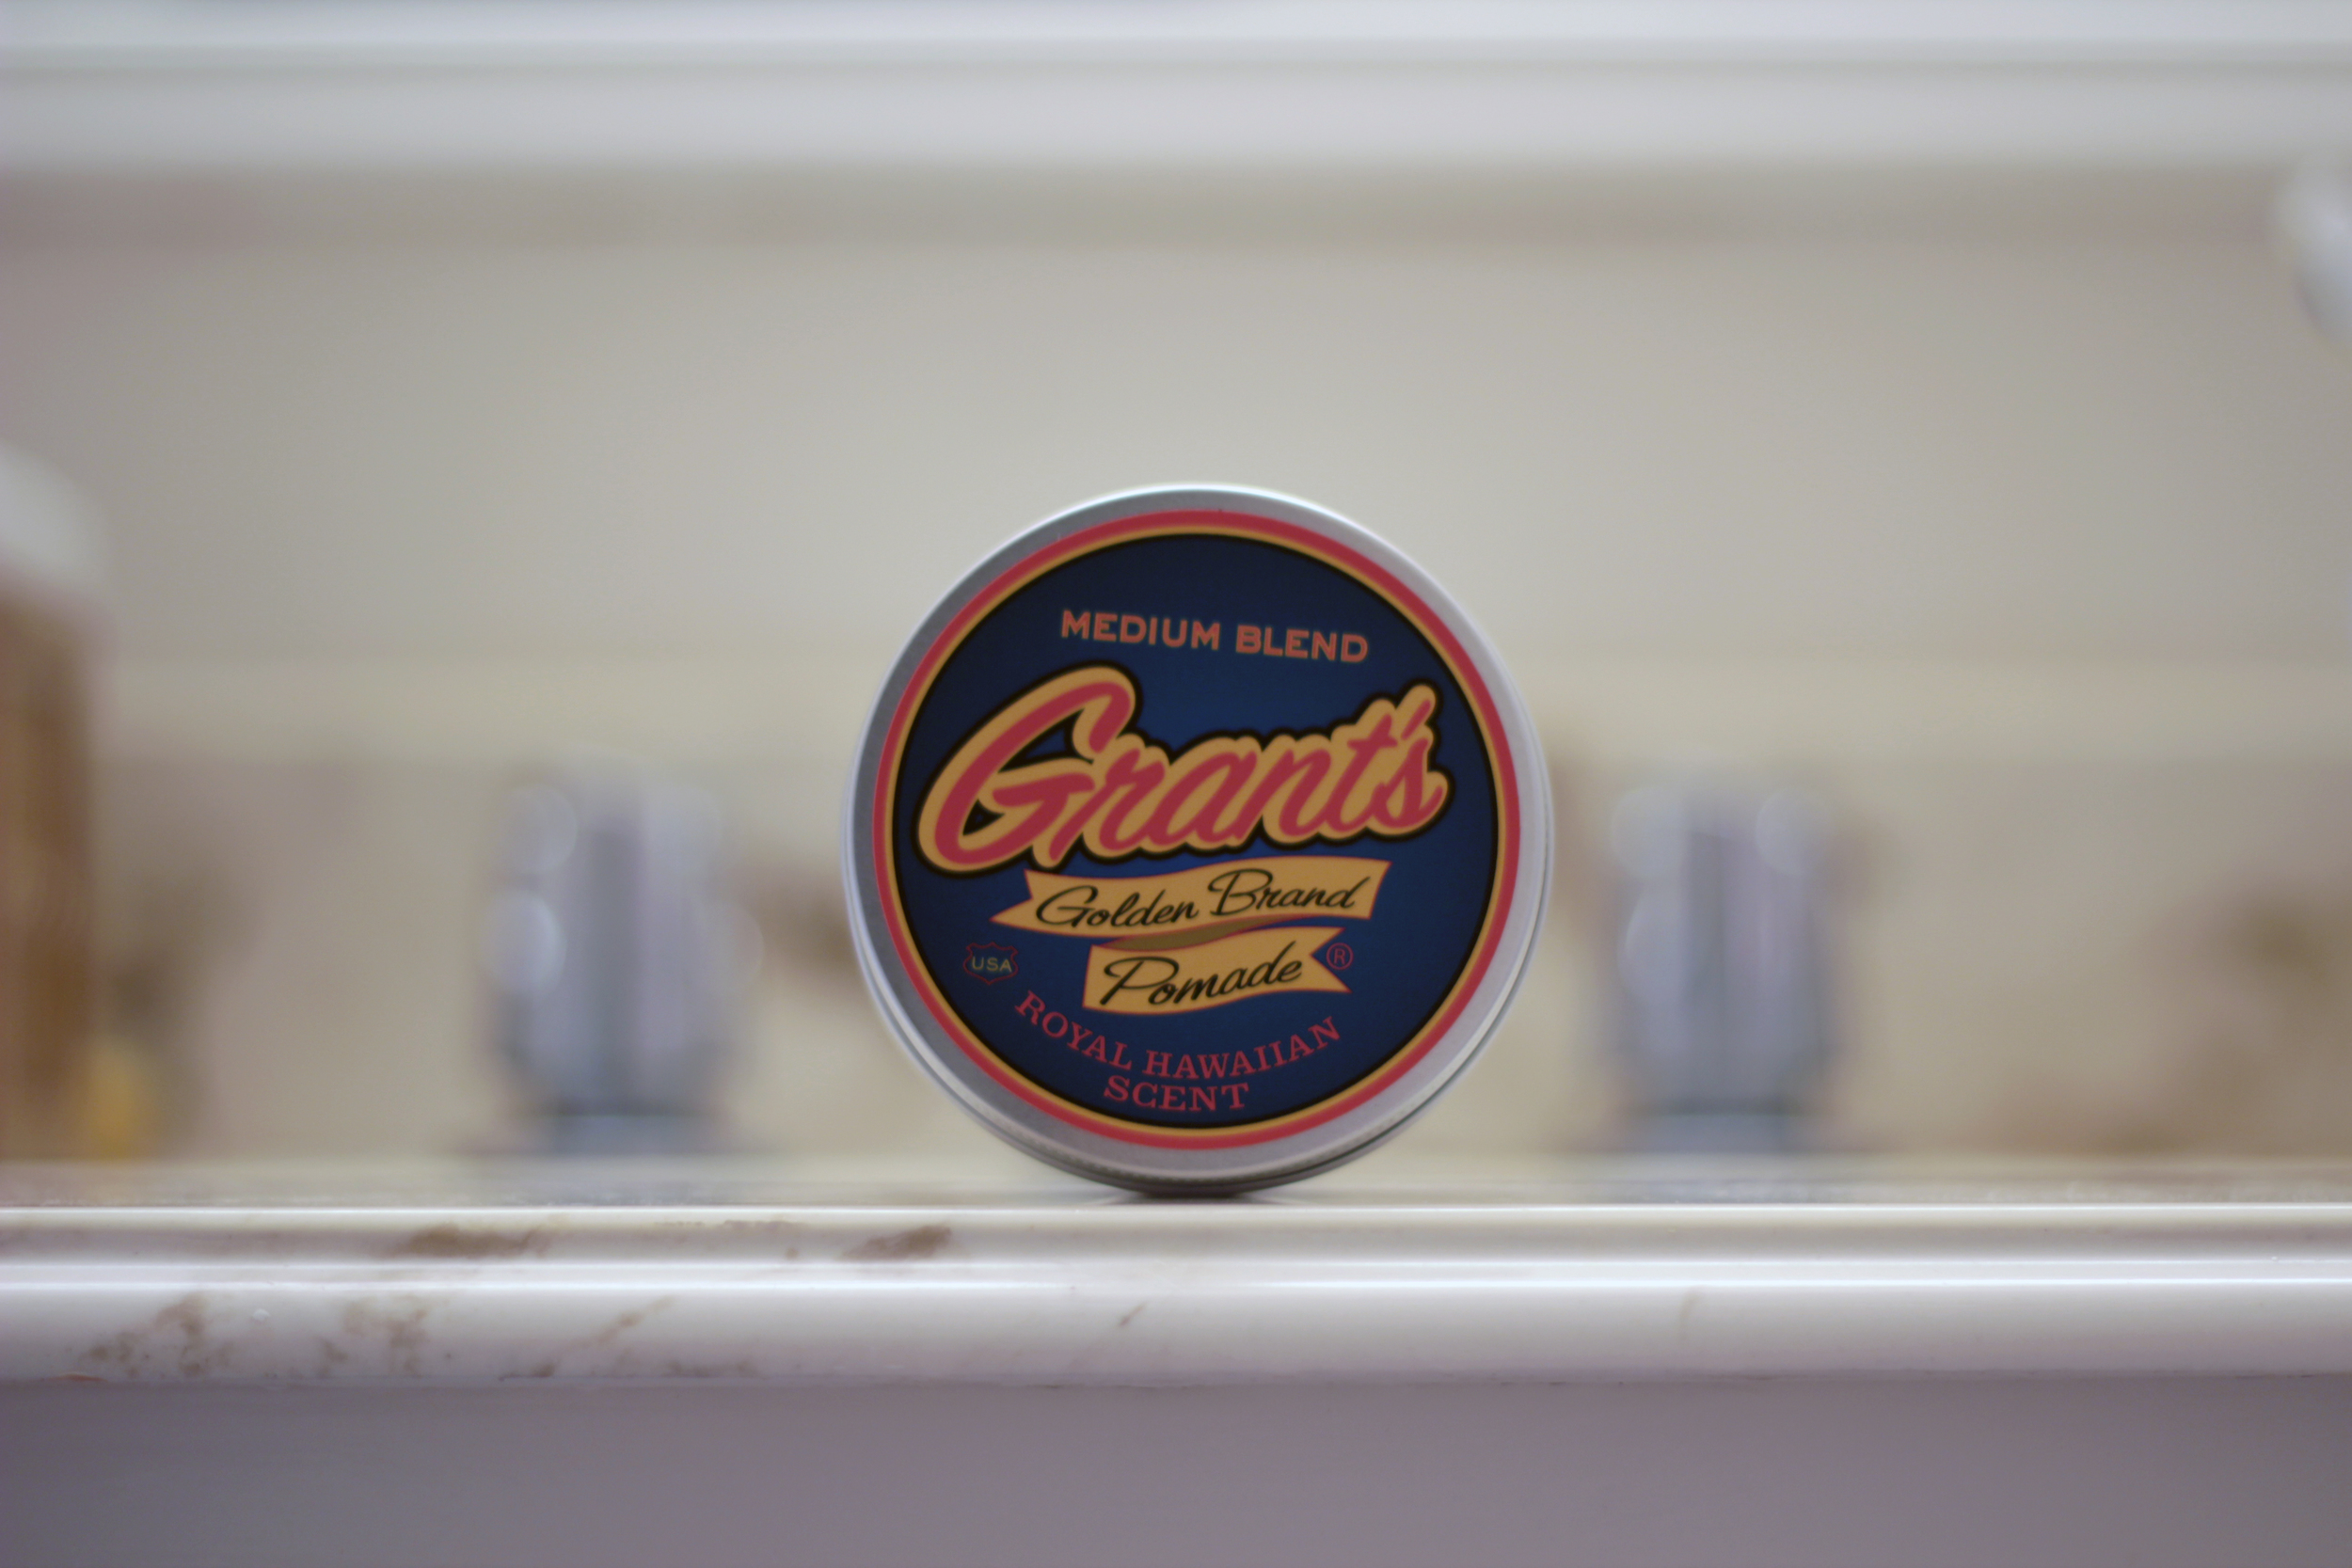 grant's golden brand medium blend jar